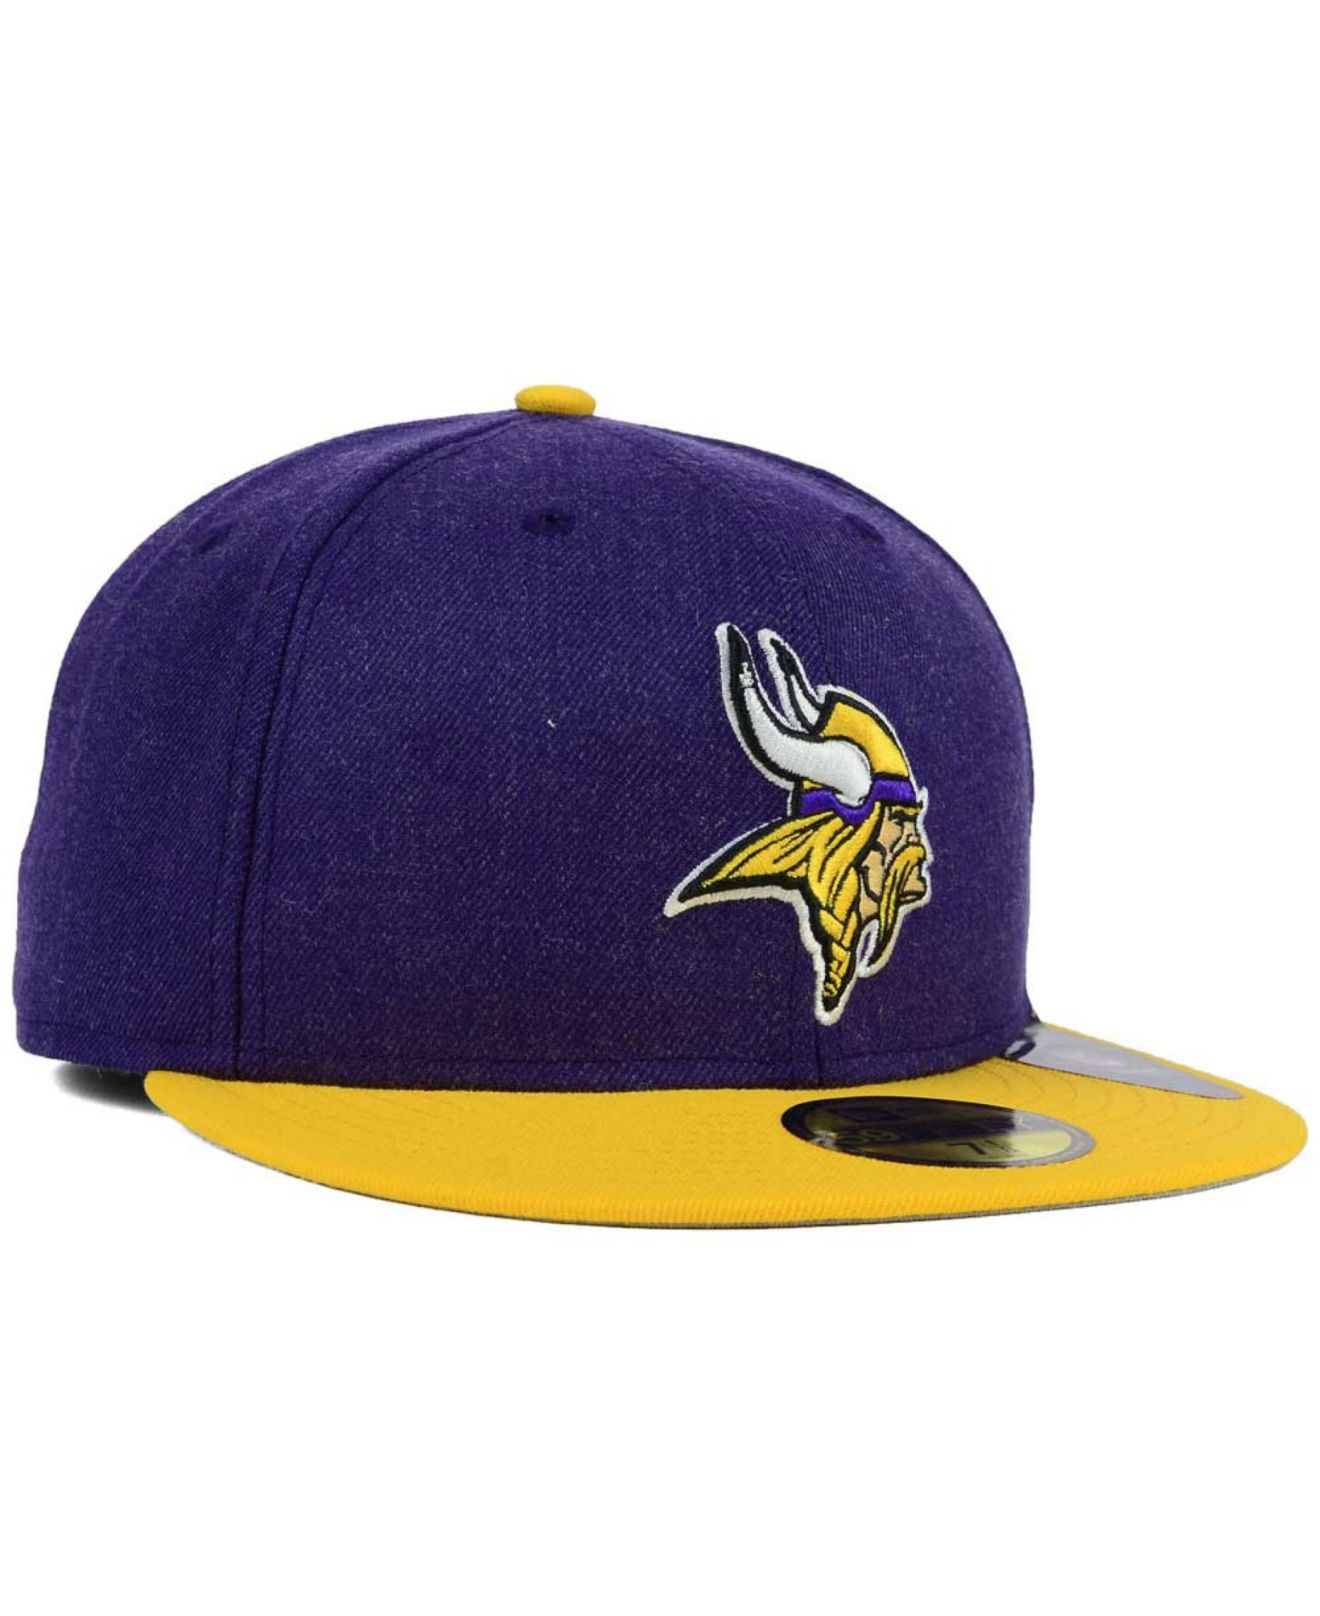 Ktz Minnesota Vikings Heather Action 2-tone 59fifty Cap in Purple ...